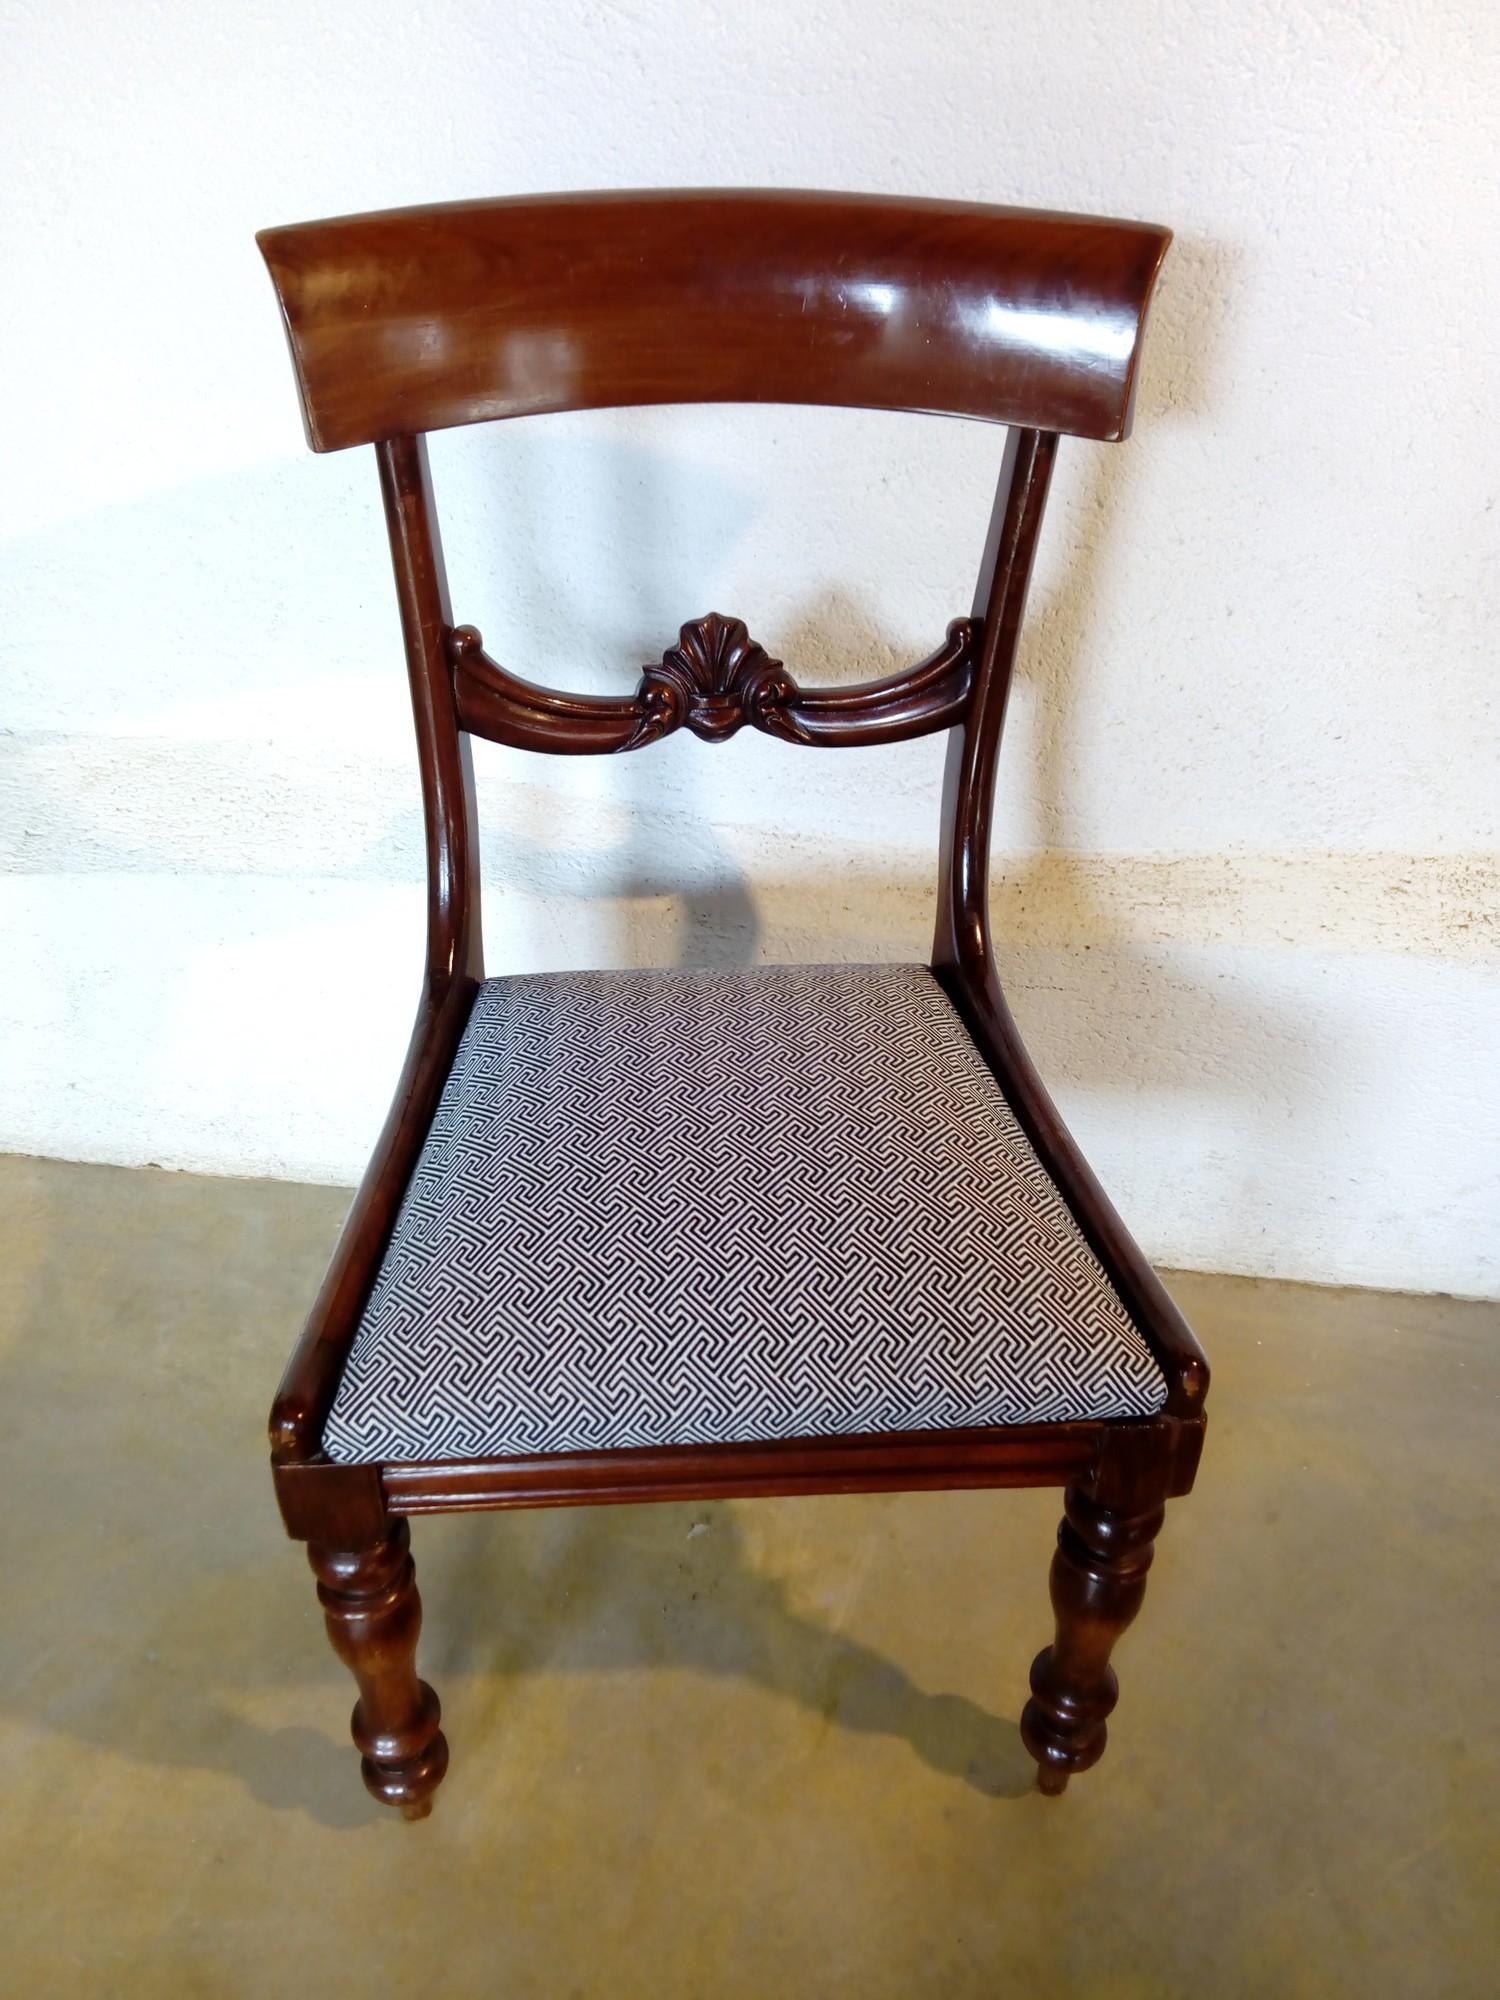 Galettes de chaises tissu Mercury, Clarke & Clarke